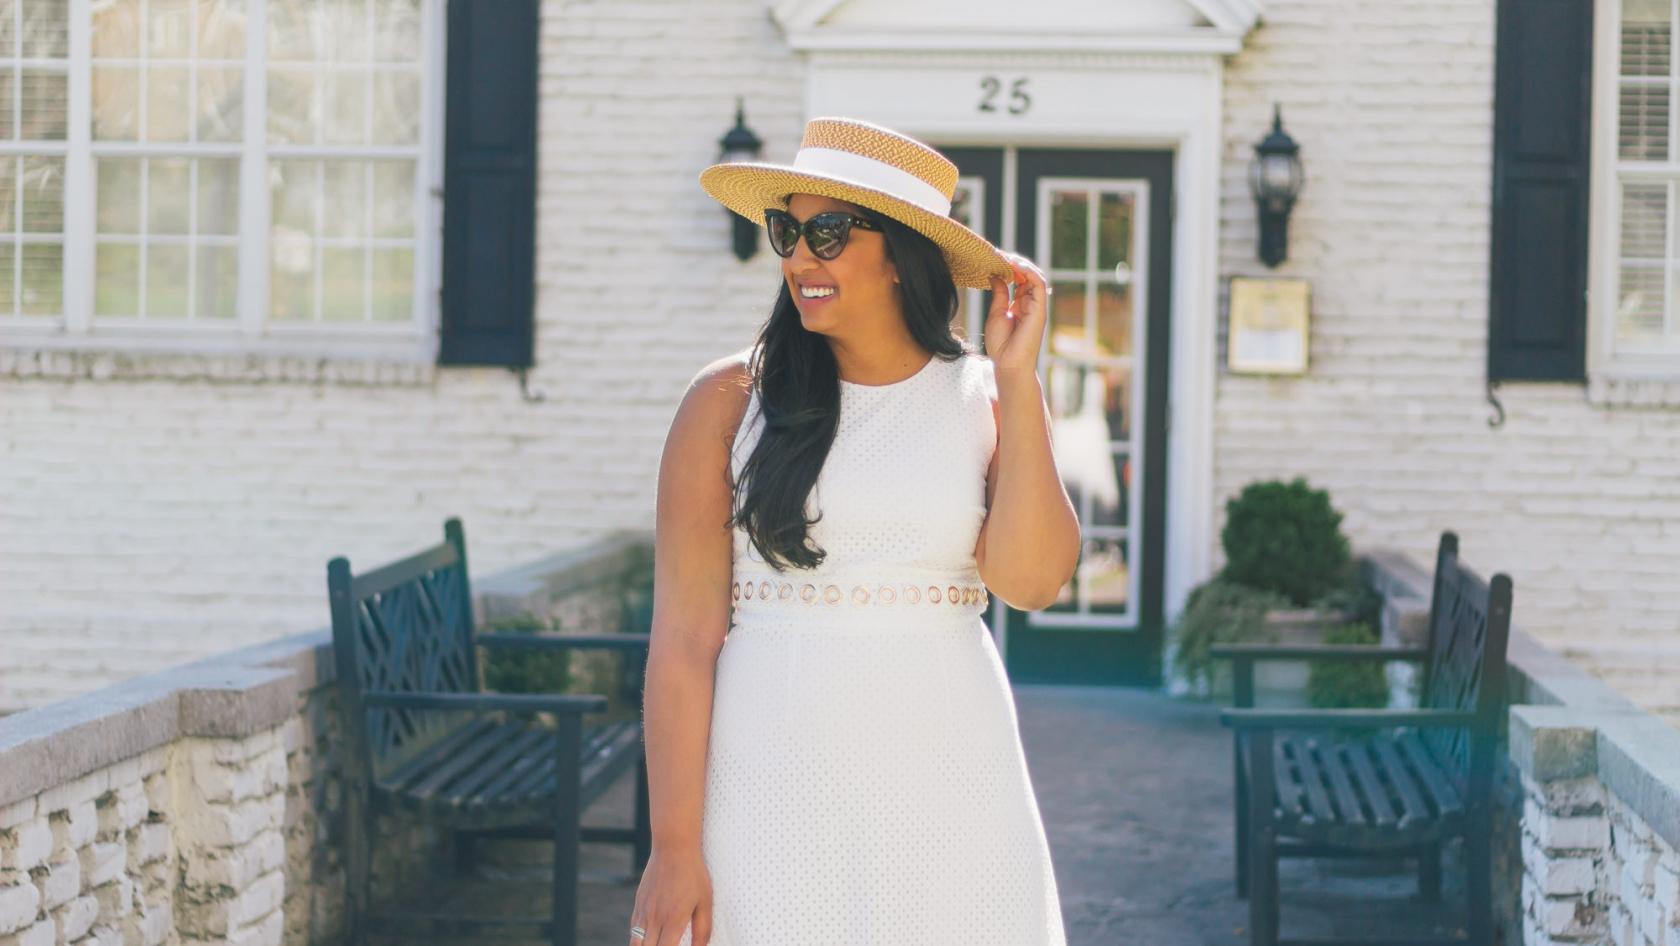 Ladylike In White